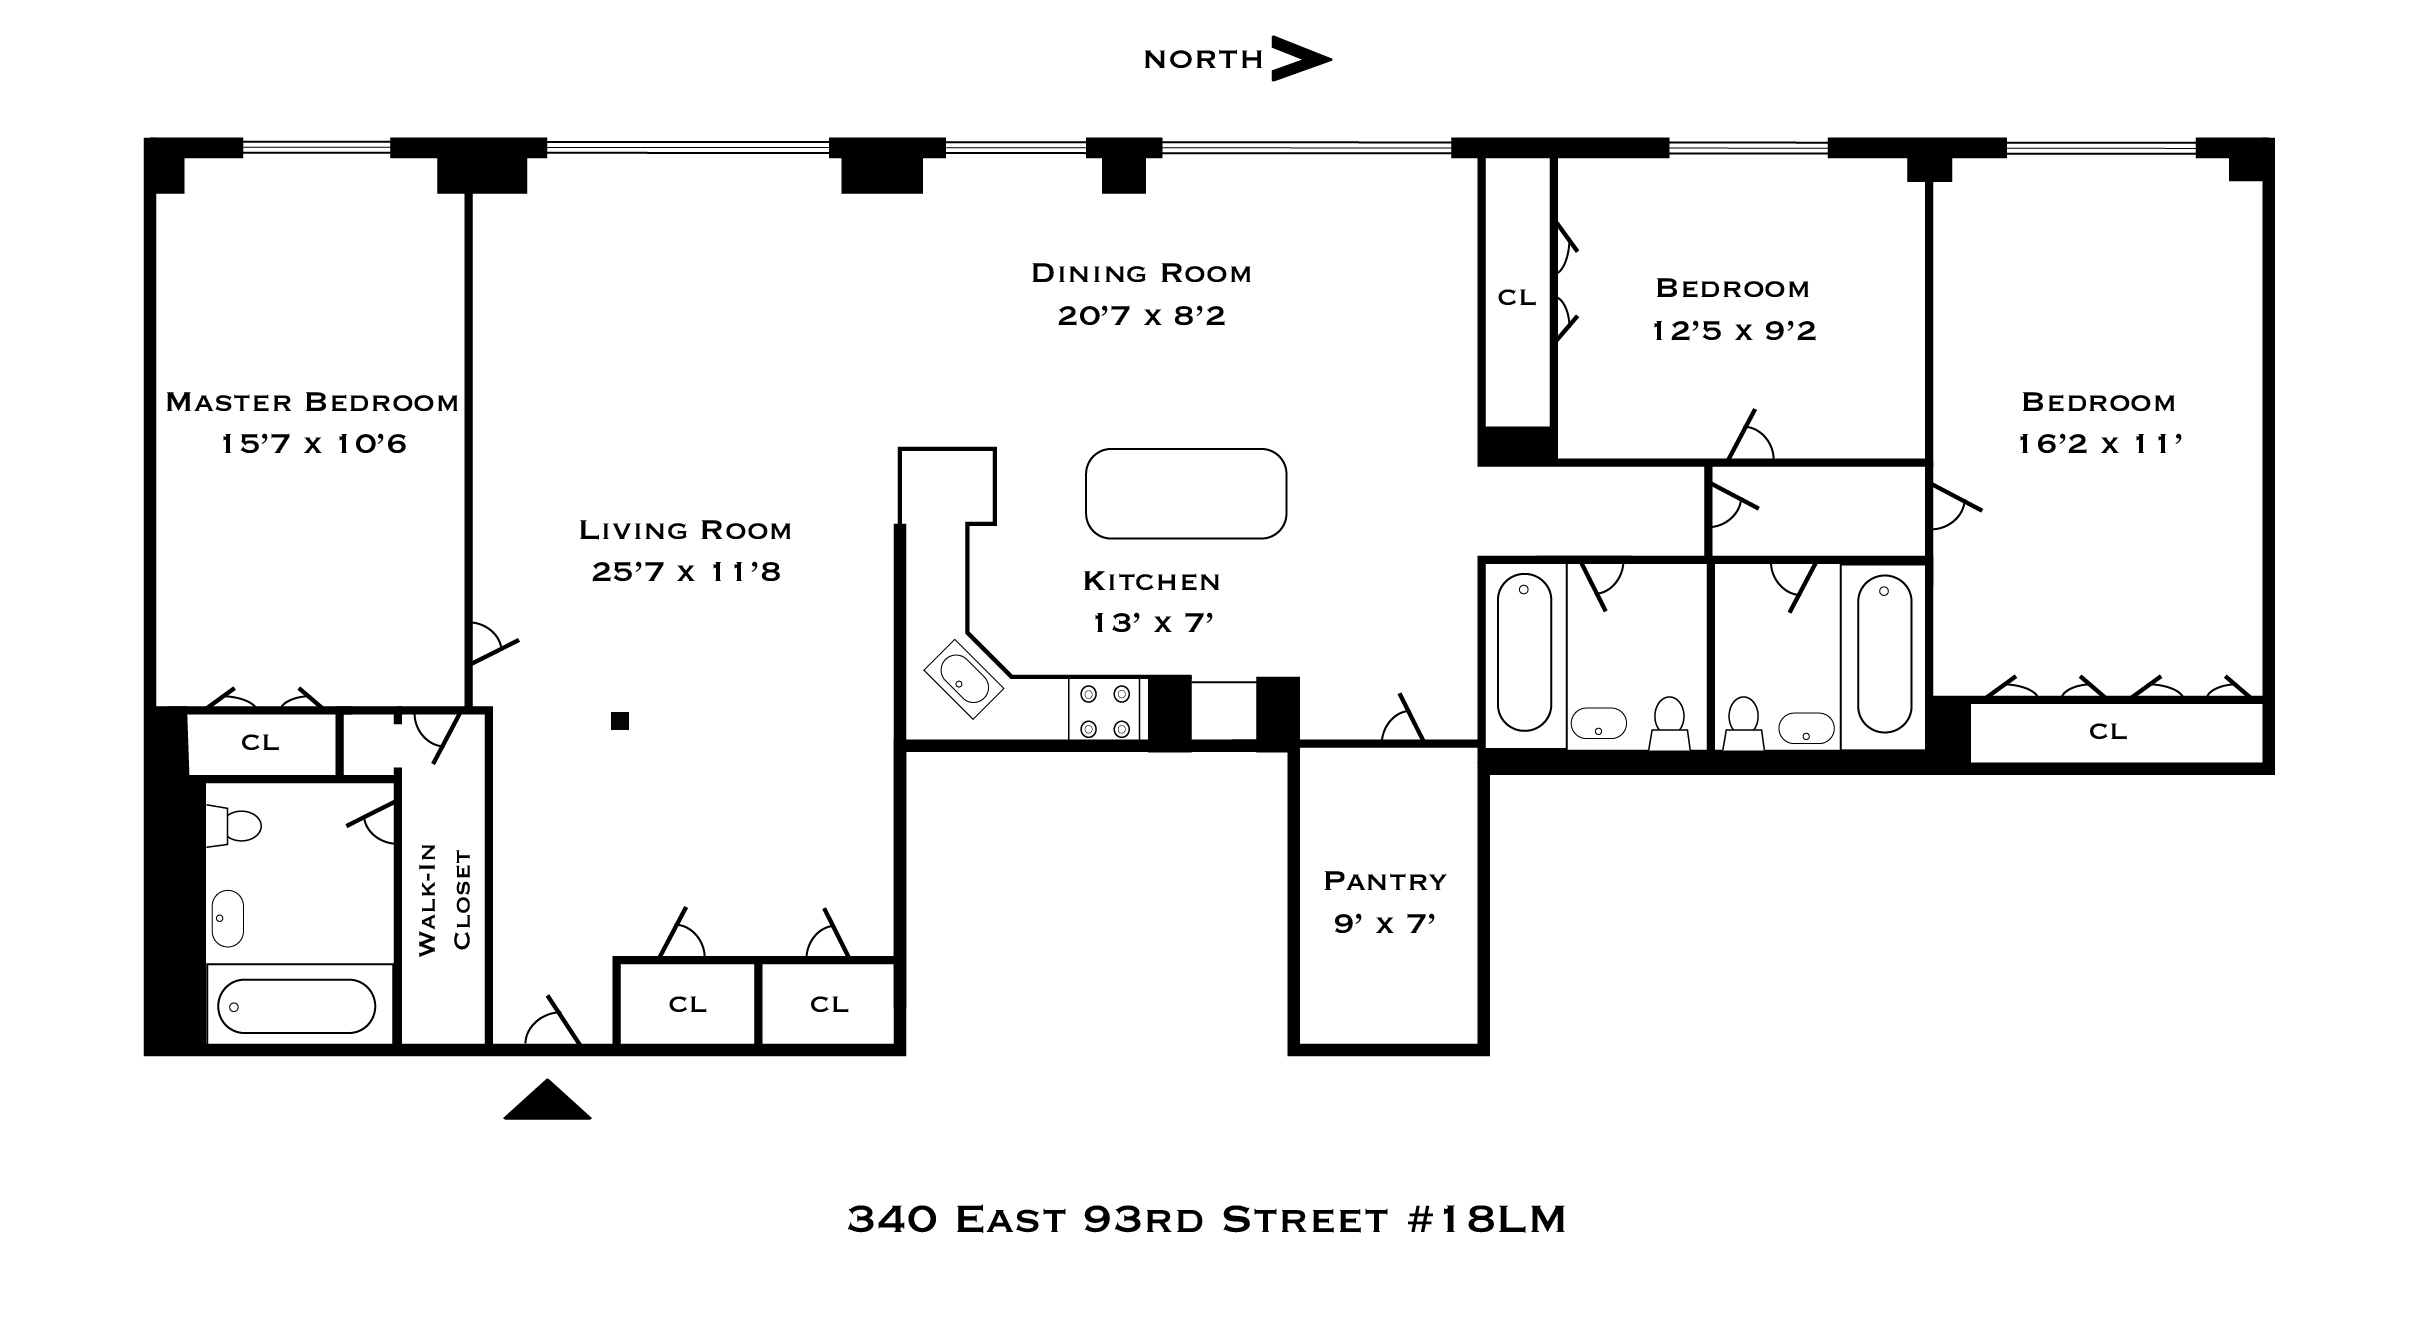 40__340east93_18LM_floorplan_edit2.jpg